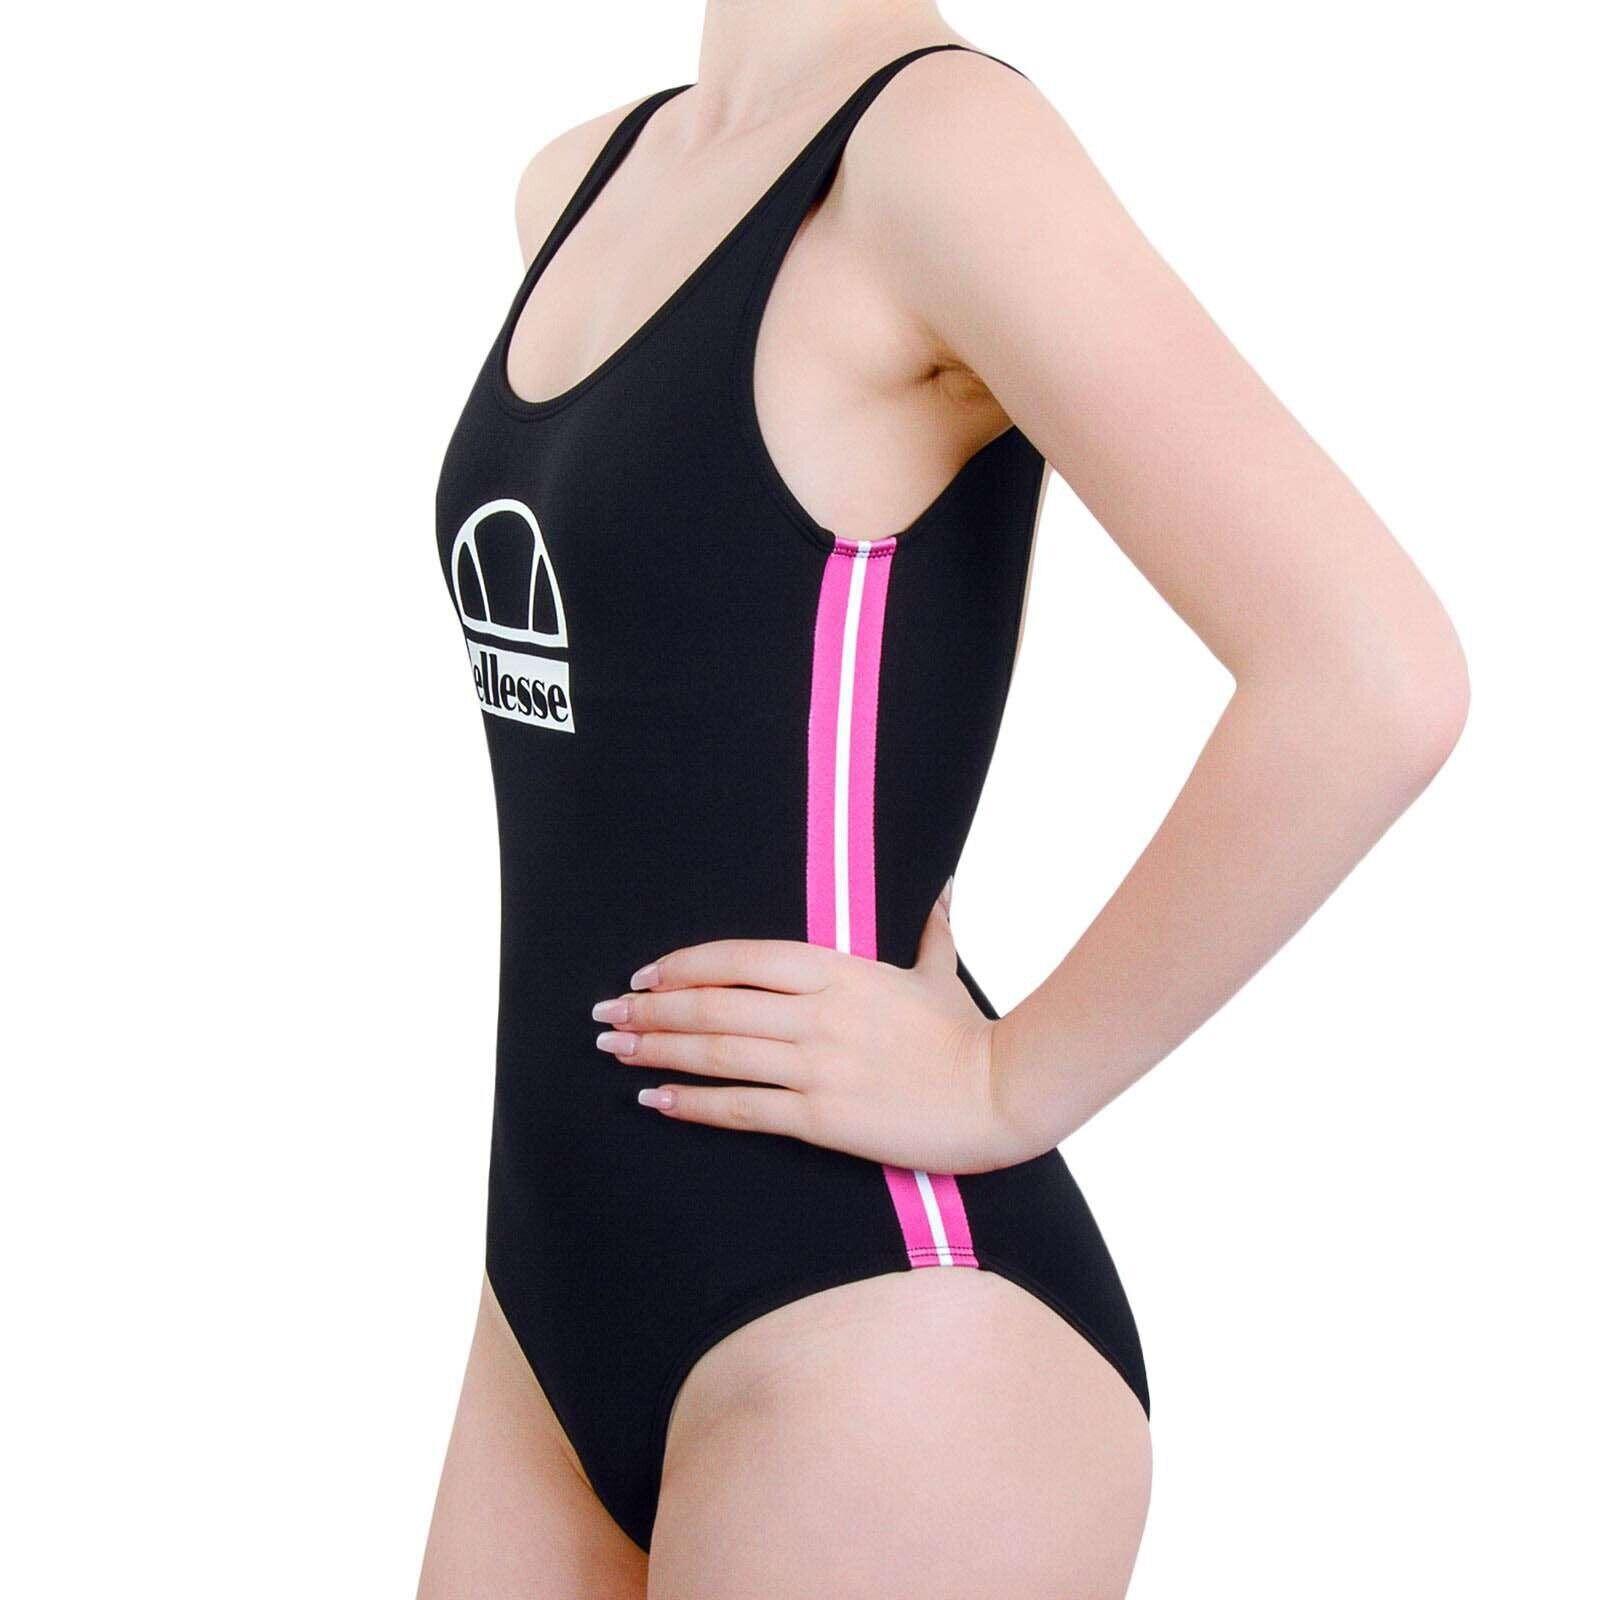 NEW! Ellesse Black Swimsuit Pink Stripes S/34-36, NP 39